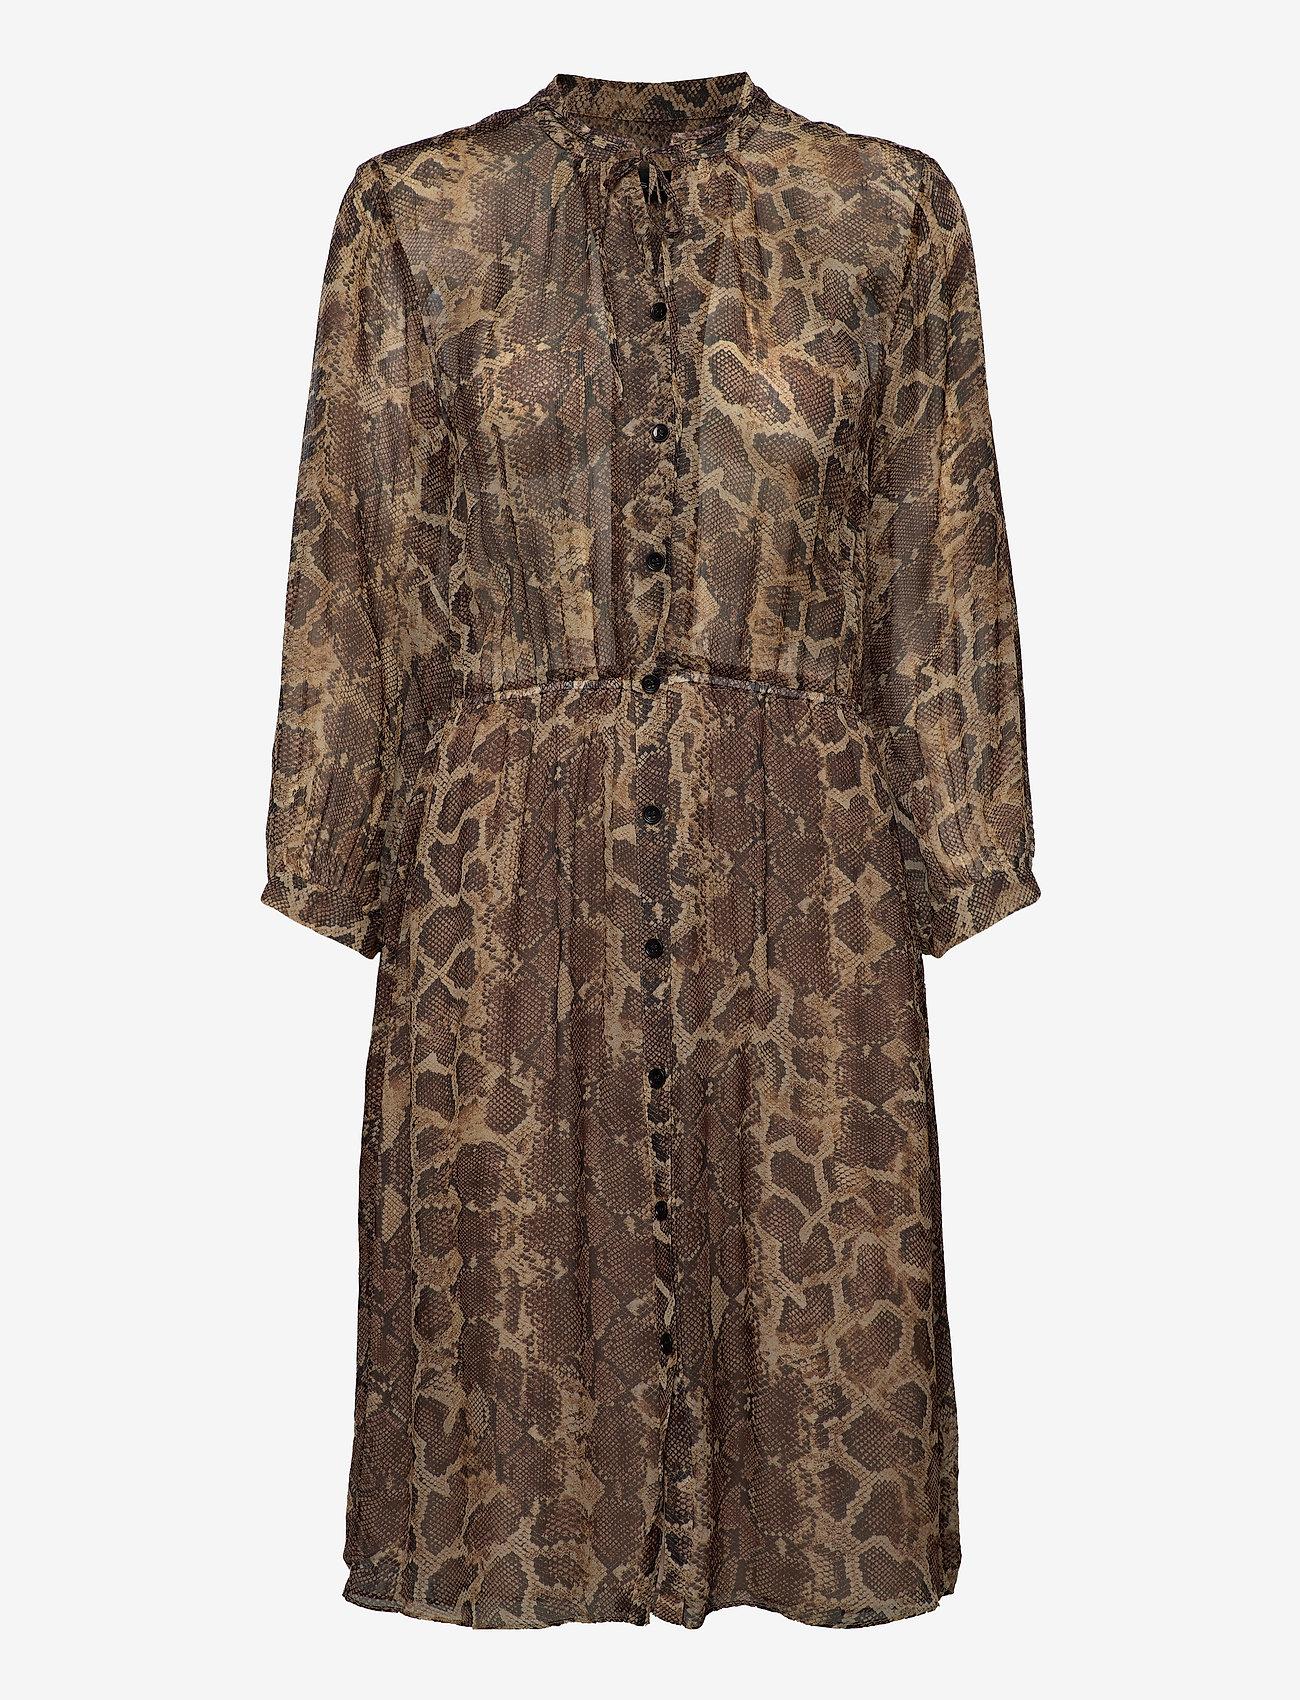 SAND - 3400 - Arlet - robes midi - pattern - 0